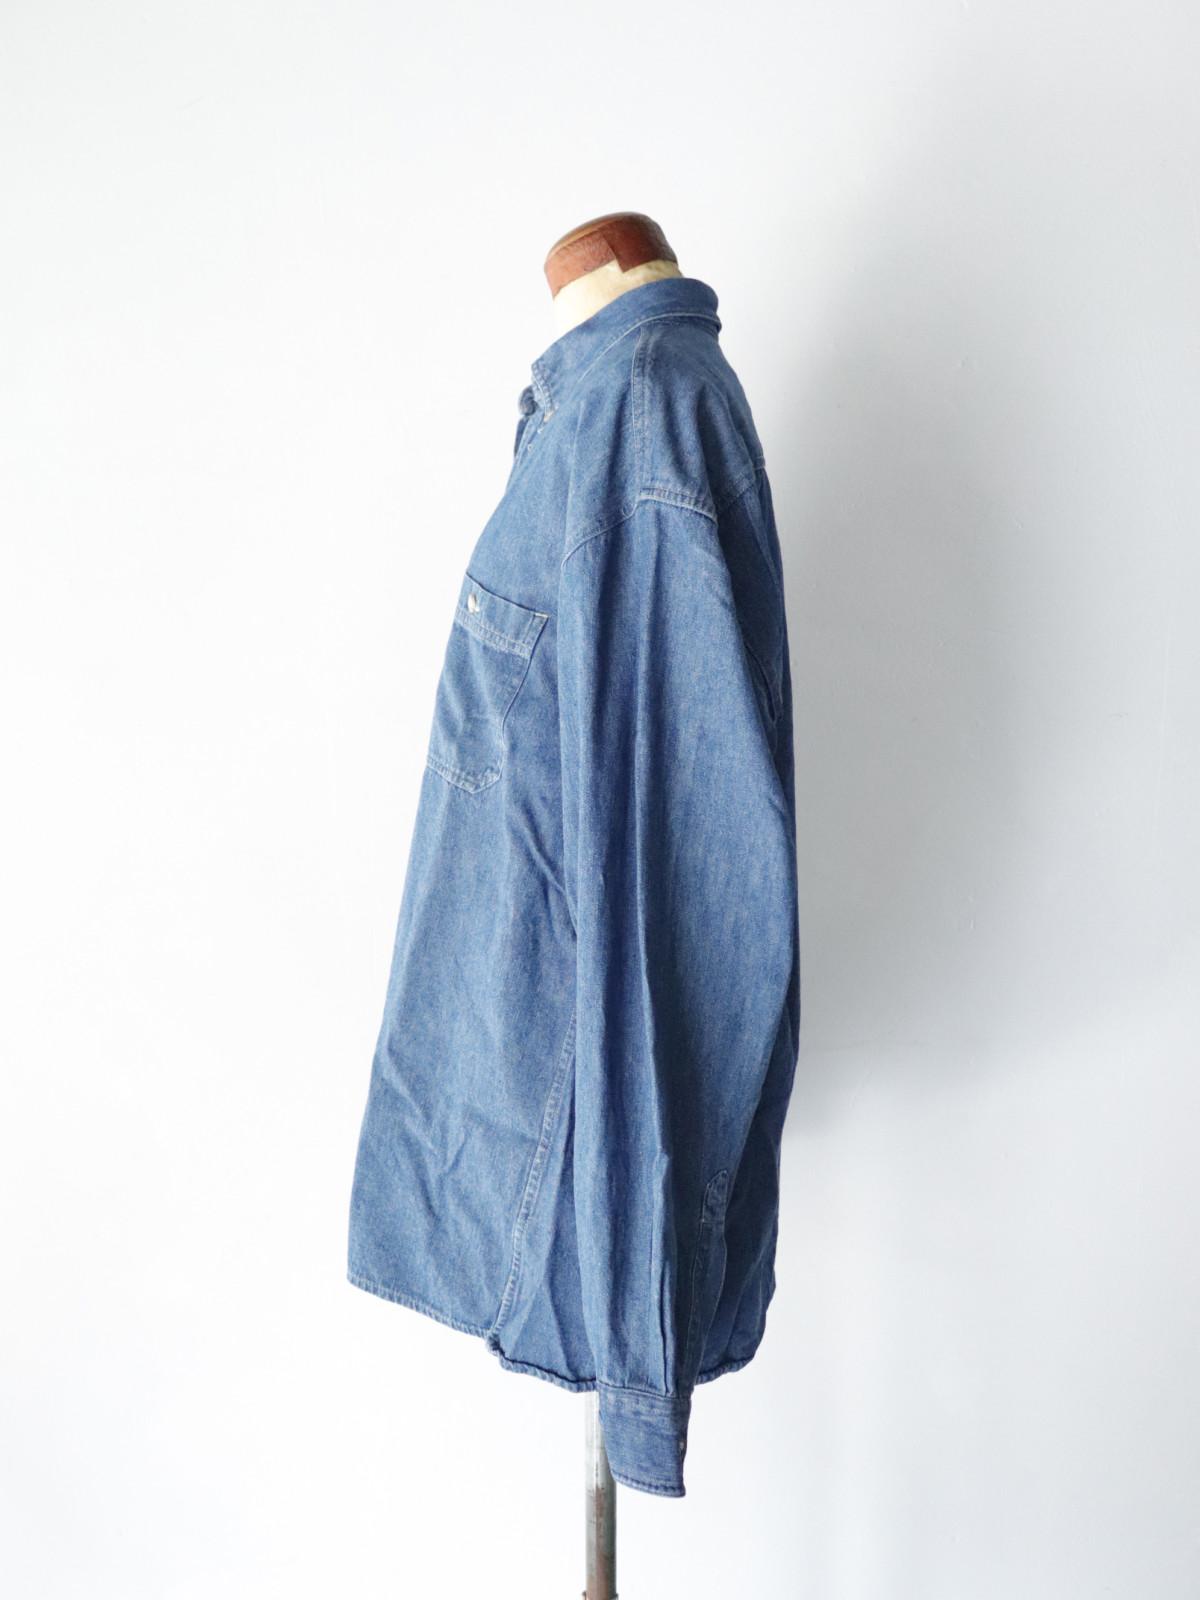 Mc ORVIS, denim shirts,Germany